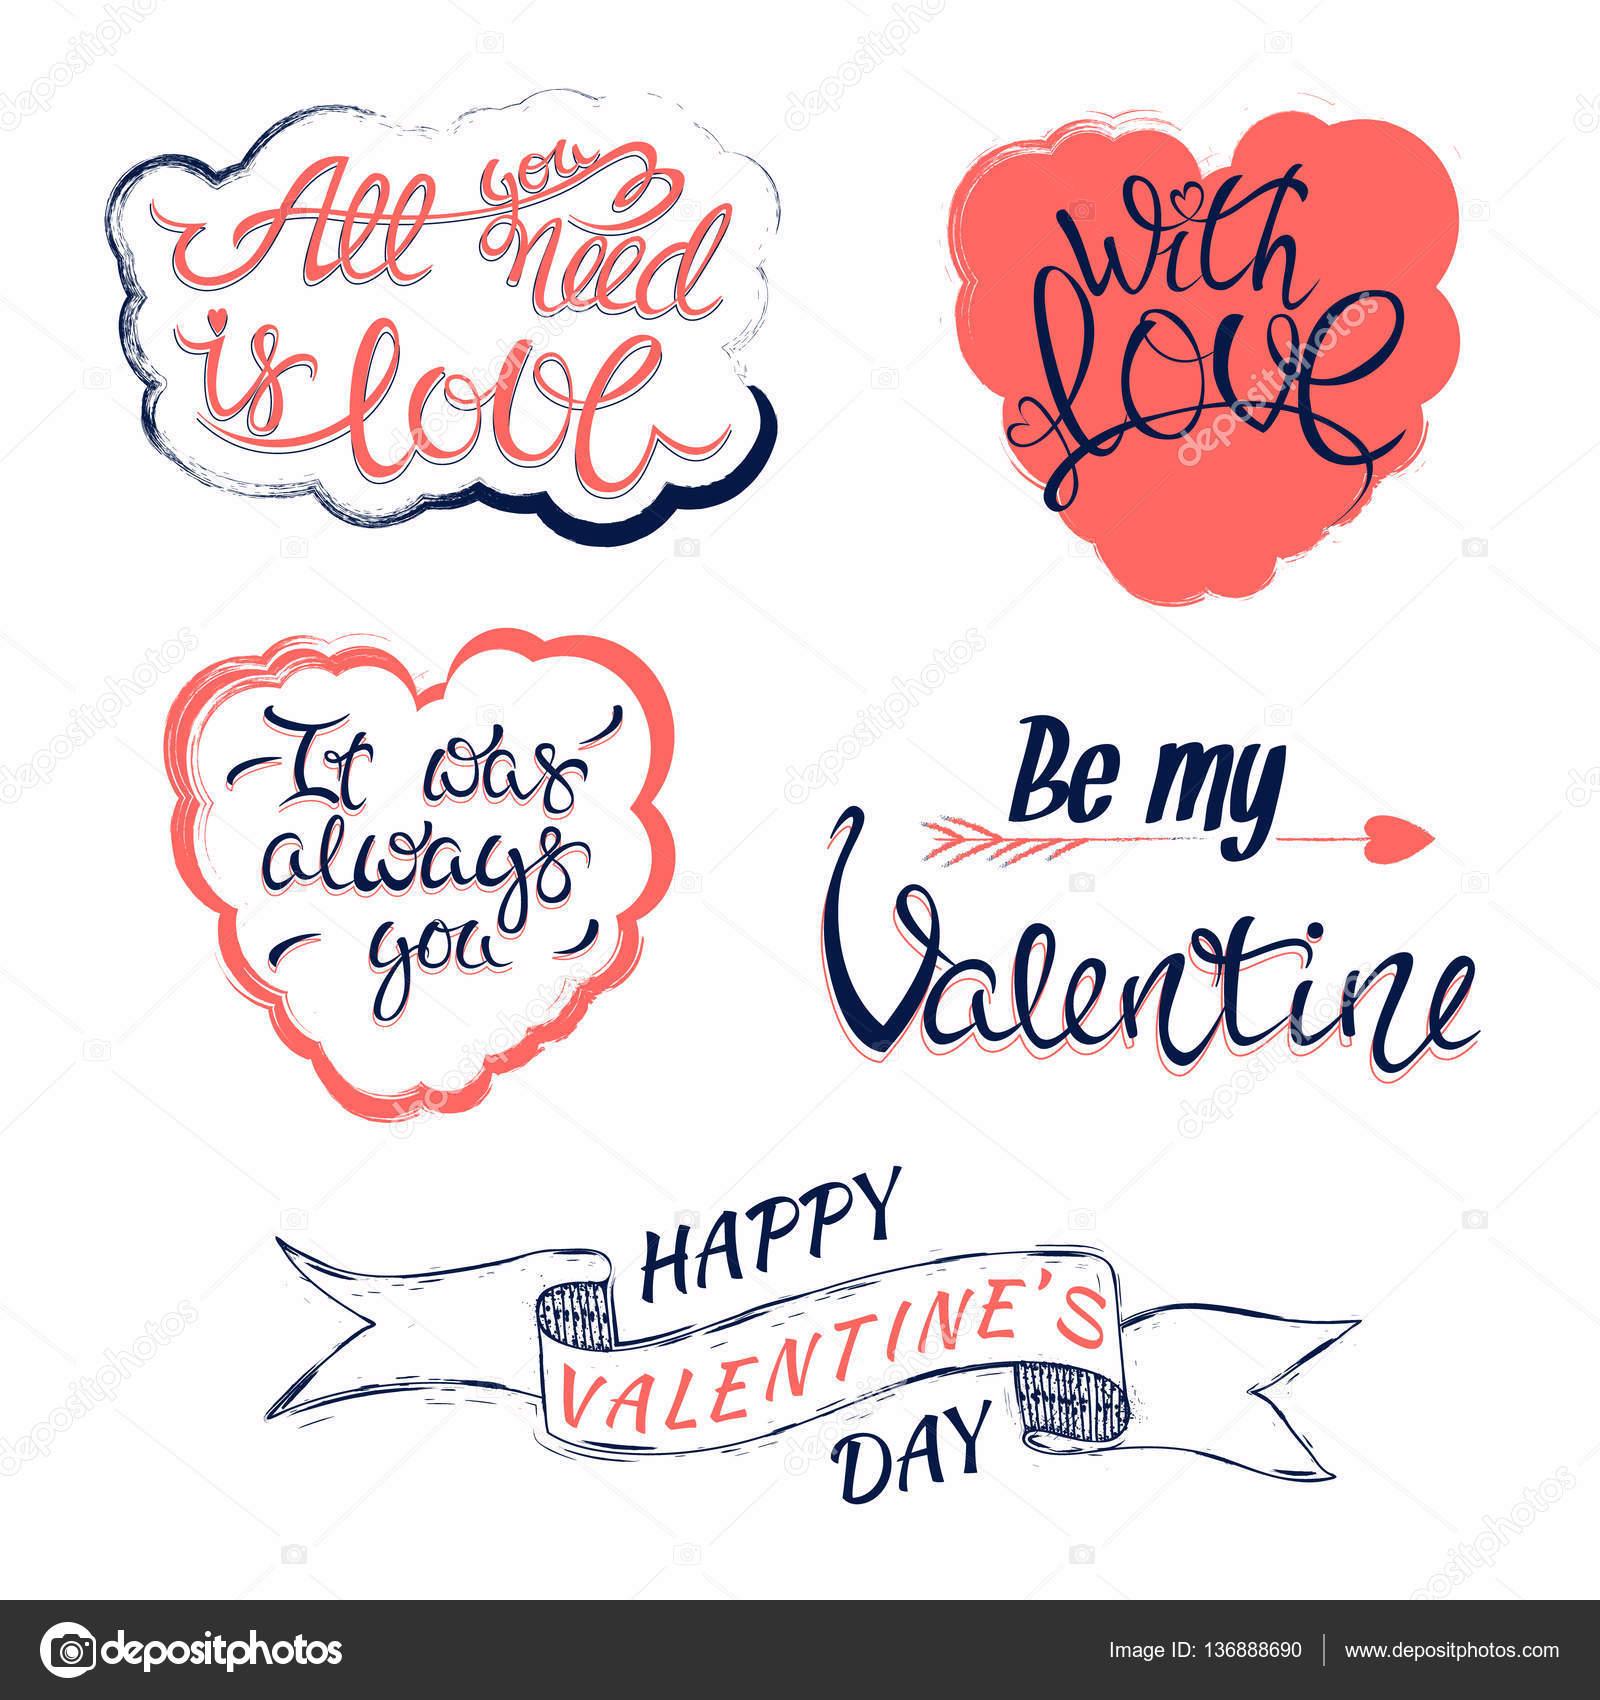 Valentines Day Elements Stock Vector C Darijashka 136888690